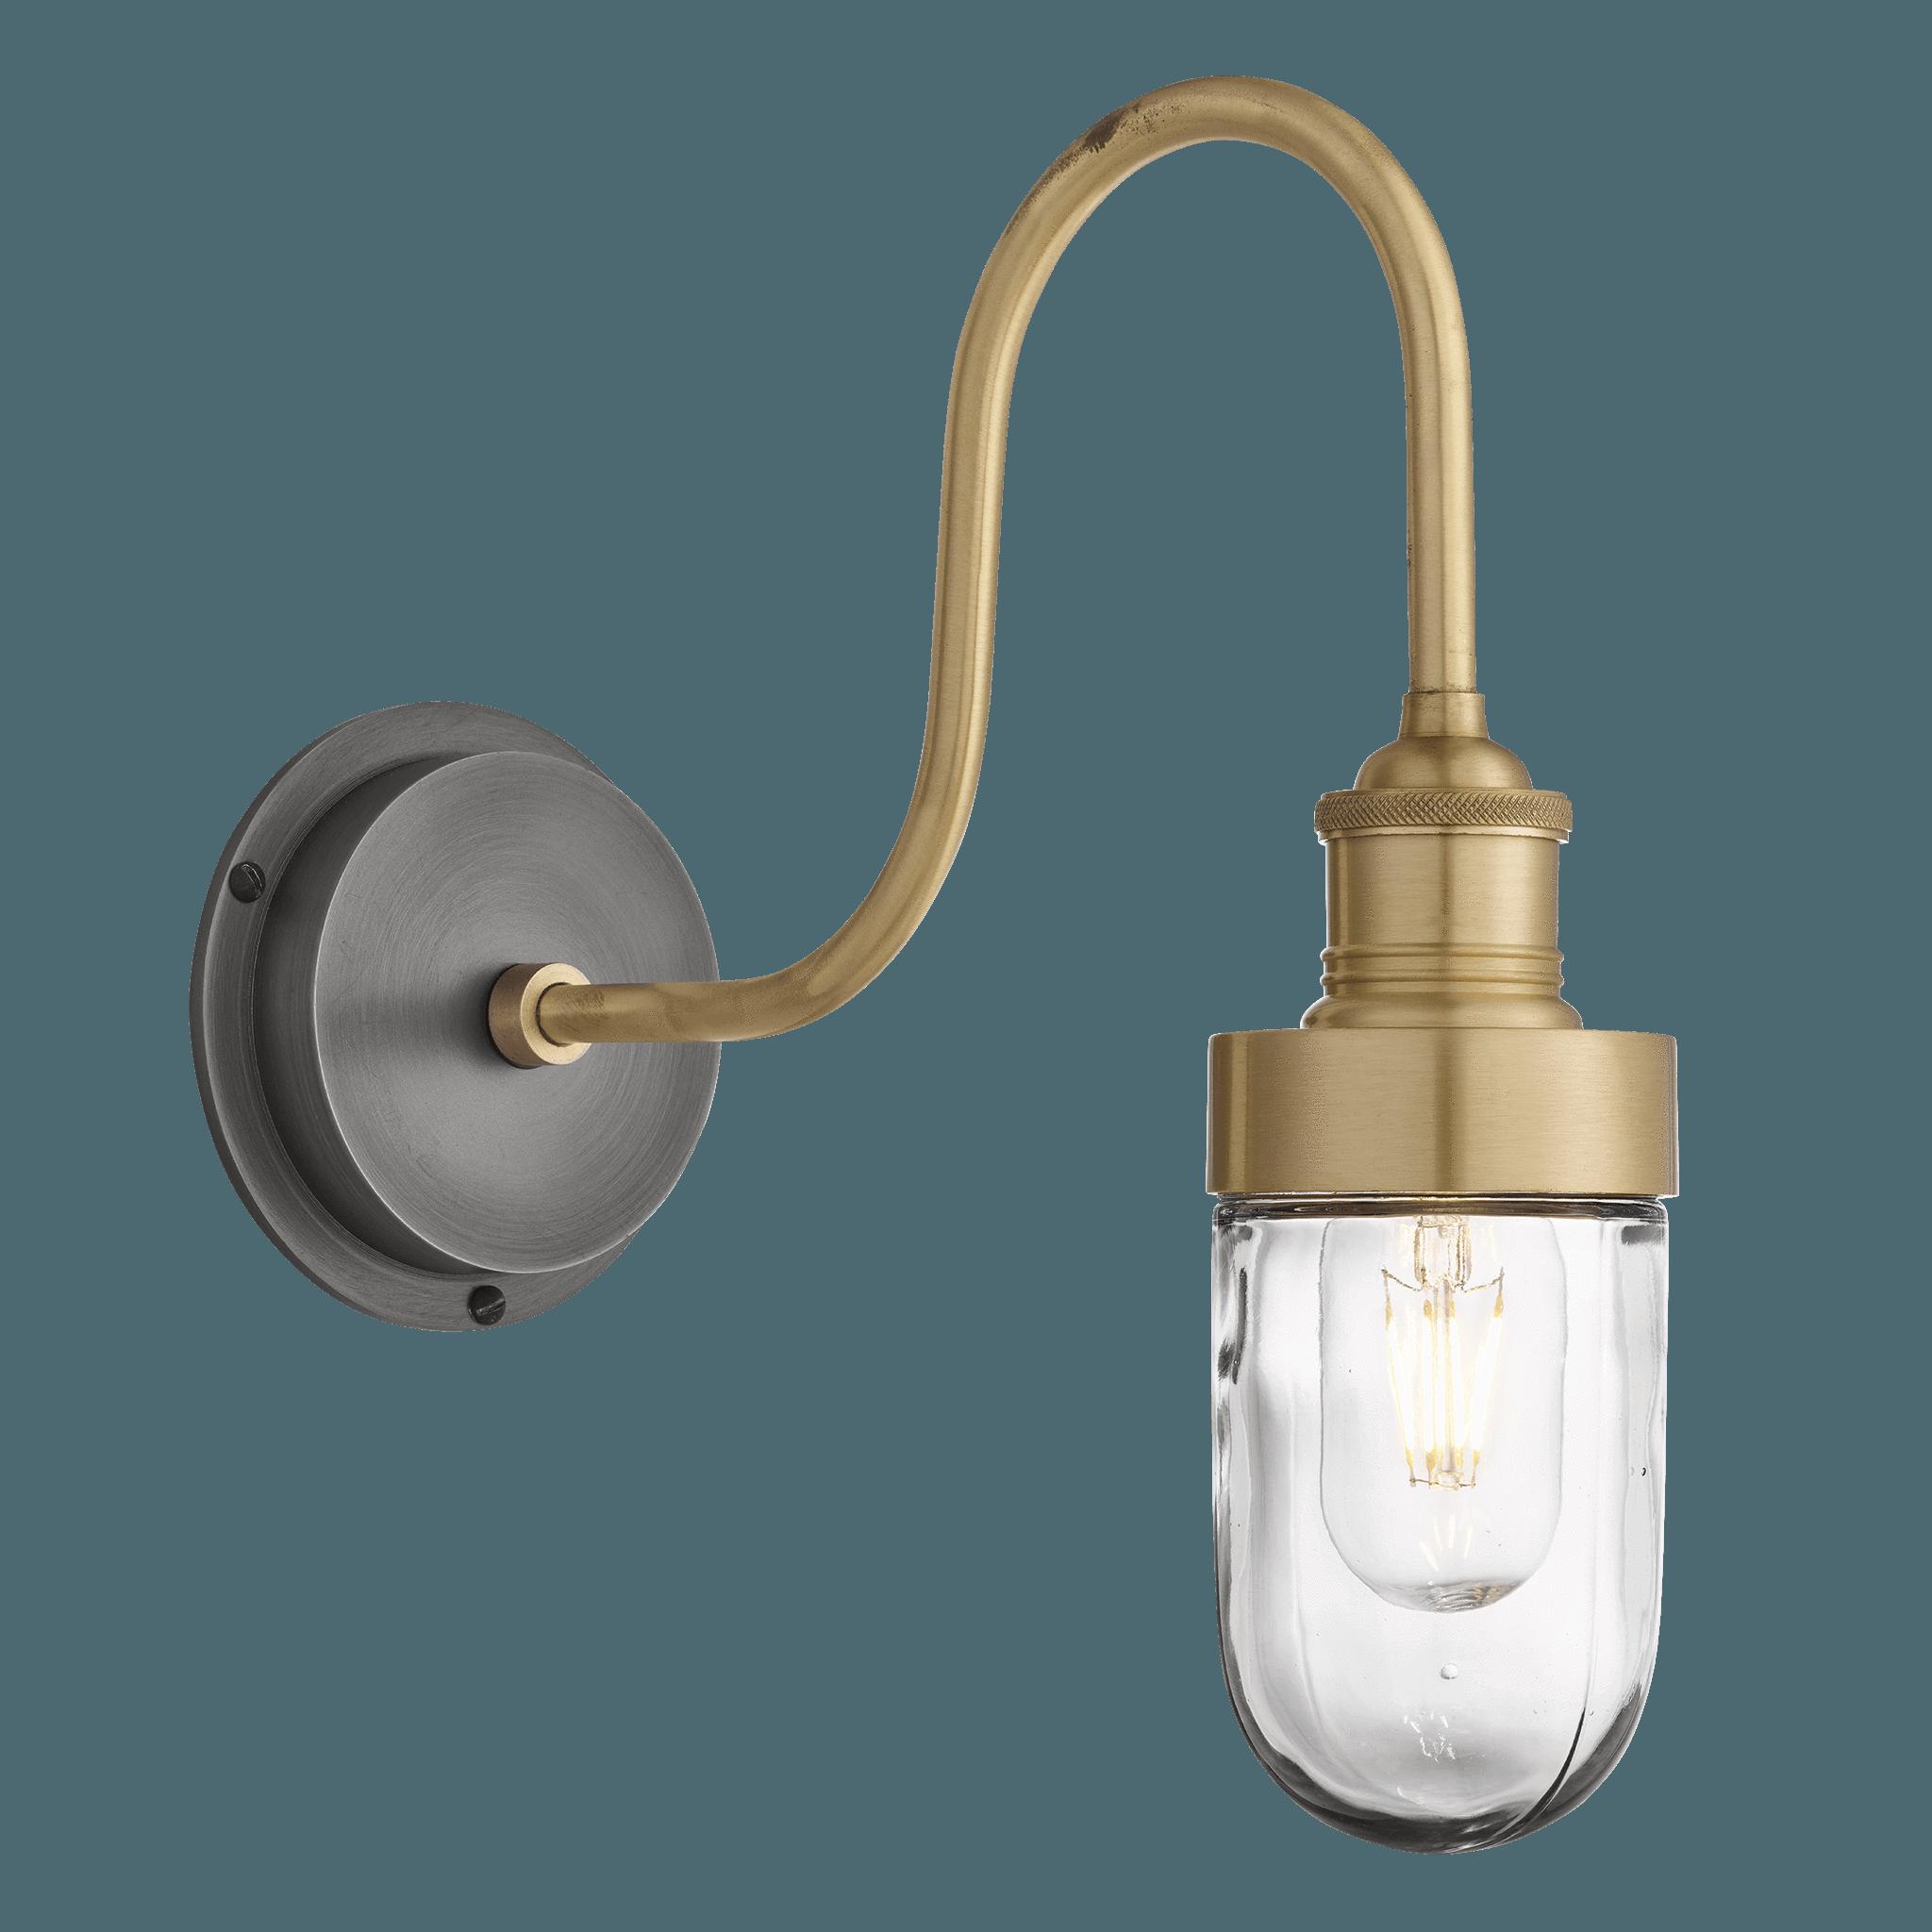 Swan Neck Outdoor Bathroom Wall Light Brass Tube Glass In 2020 Wall Lights Industrial Wall Lights Bathroom Wall Lights